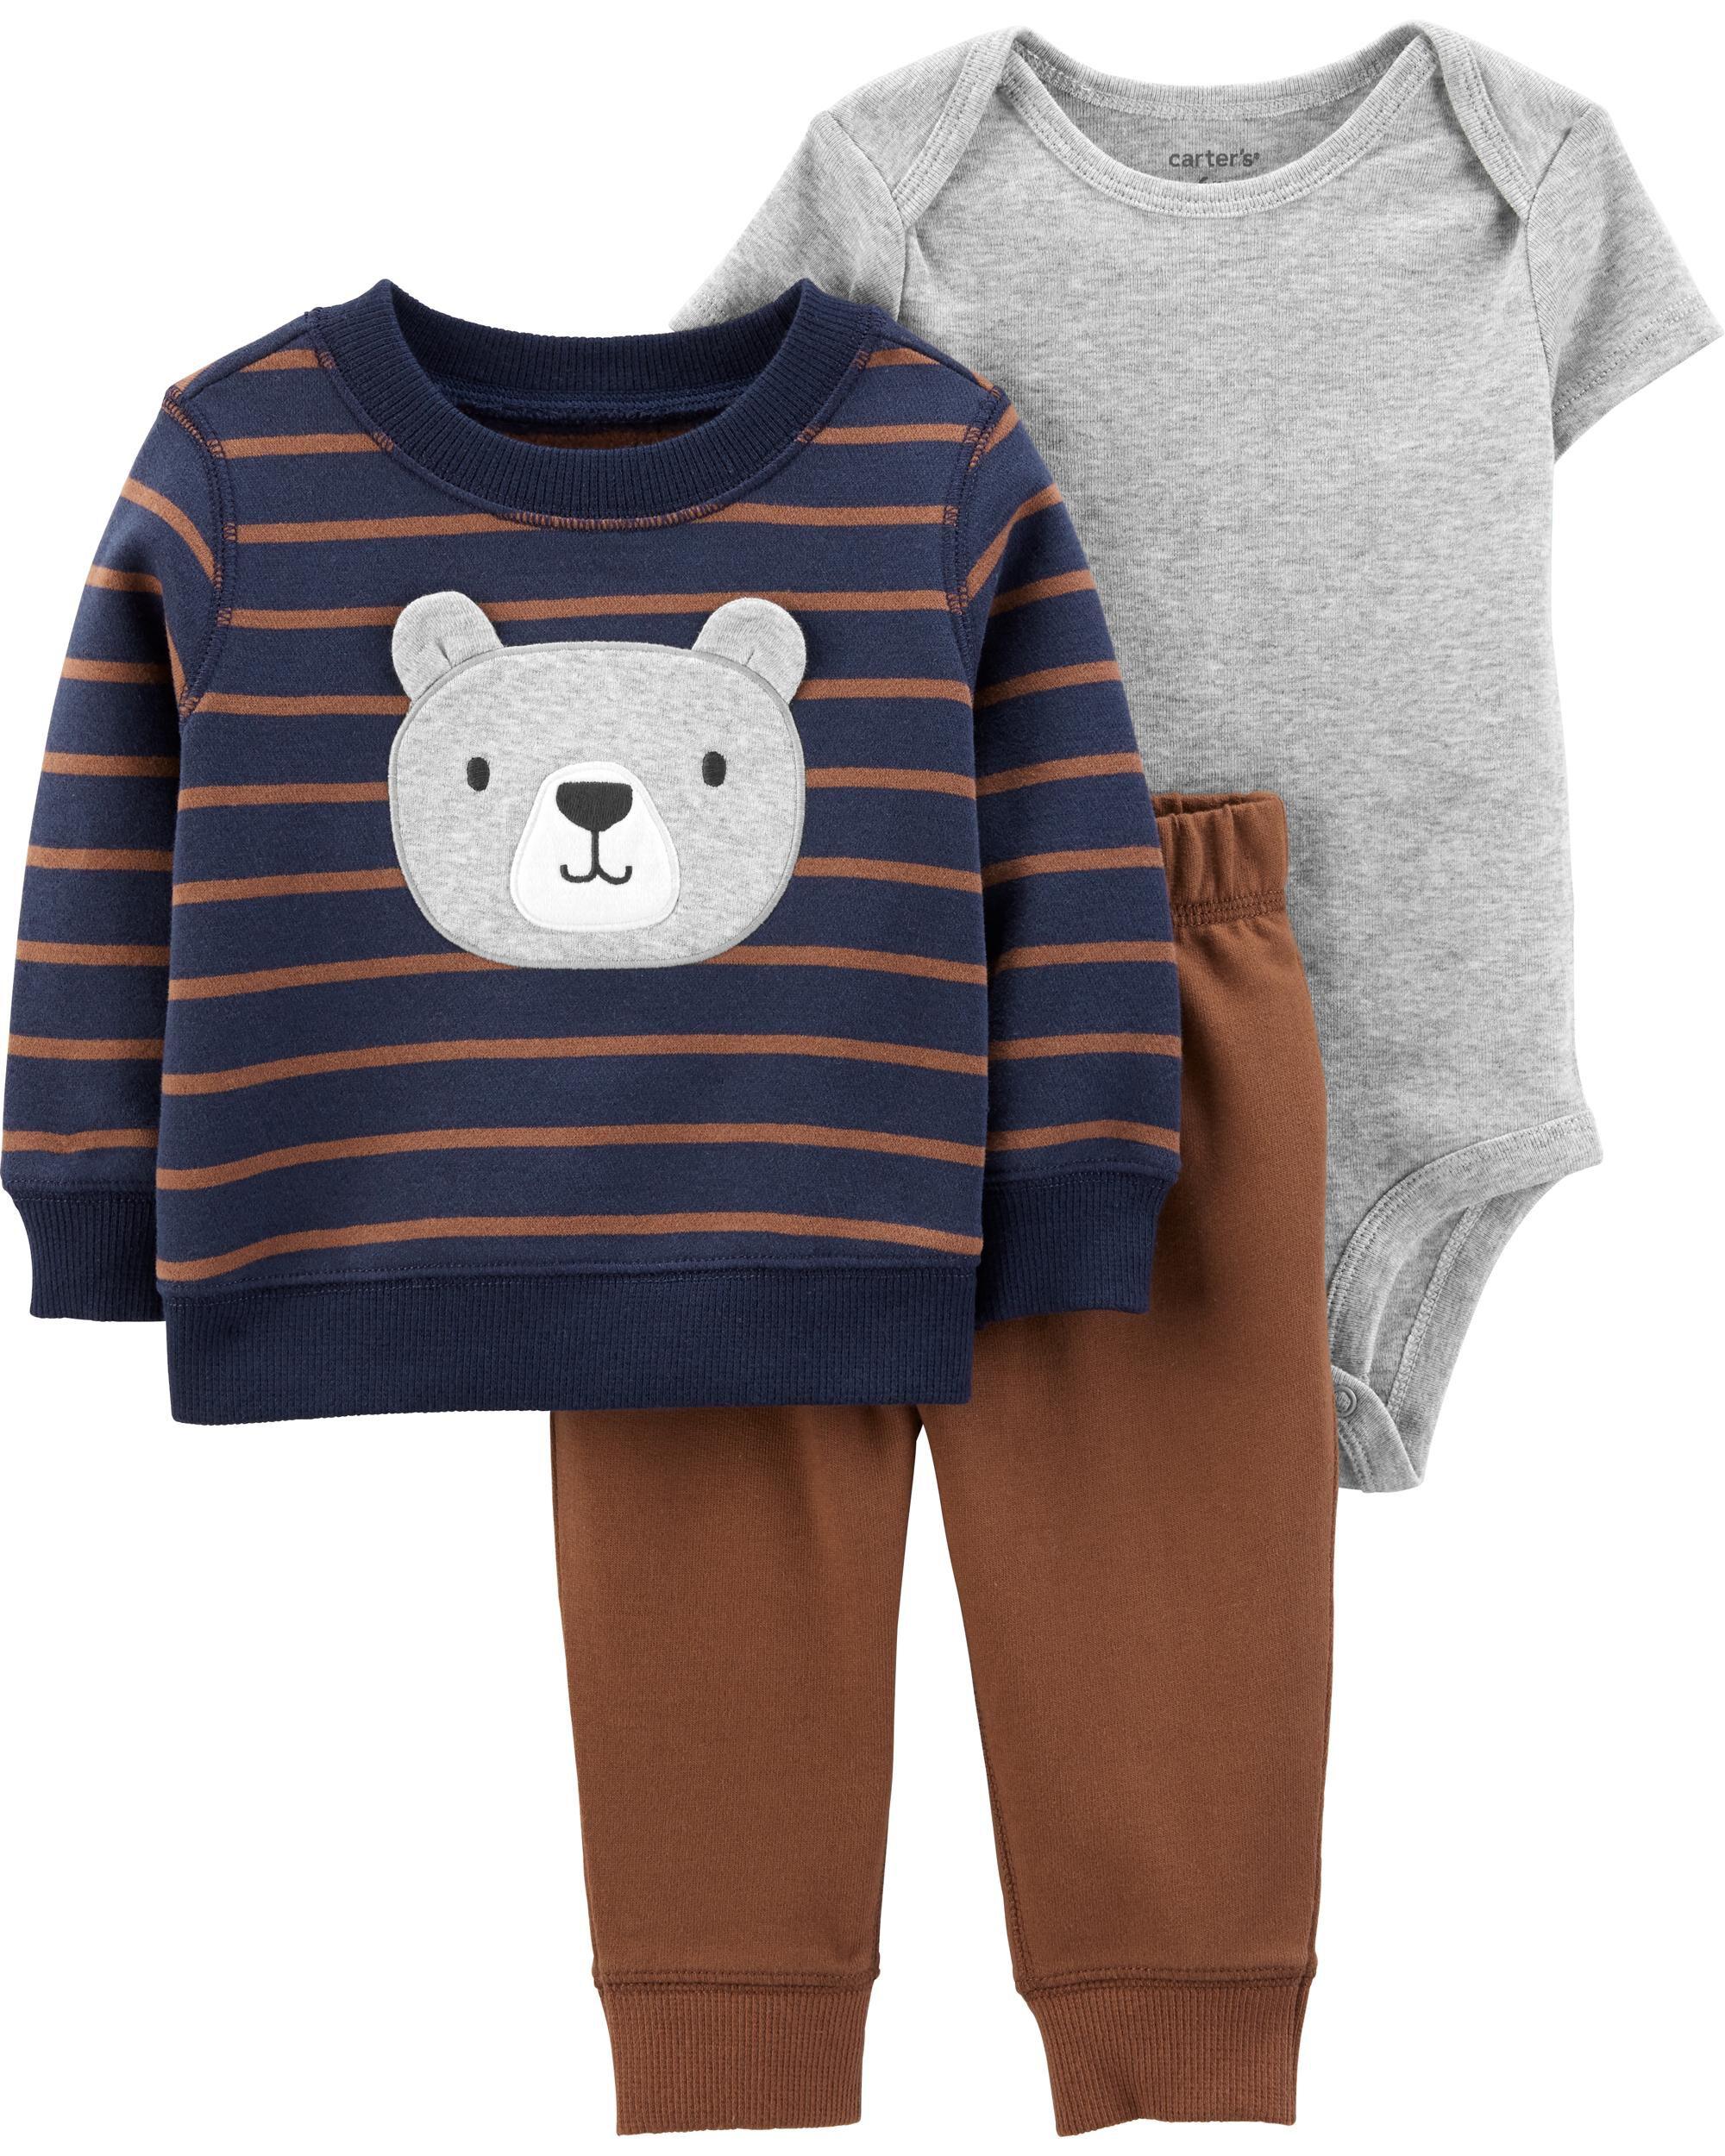 New Carter/'s Boys 3 Piece Cardigan Bodysuit Pant Set Terry Bear NB 3m 6m 9m 12m